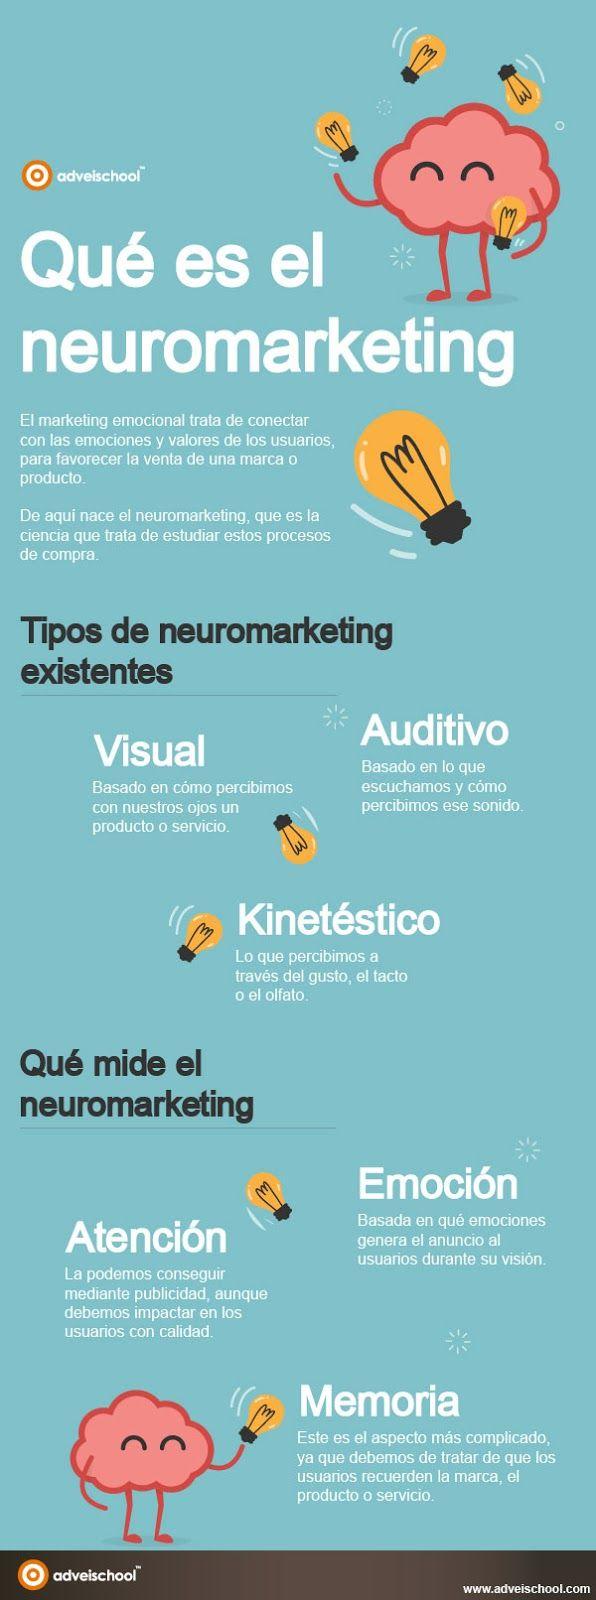 Qué es el neuromarketing #Infografia #Infographic #Marketing #Mercadotecnia - UHE Blog